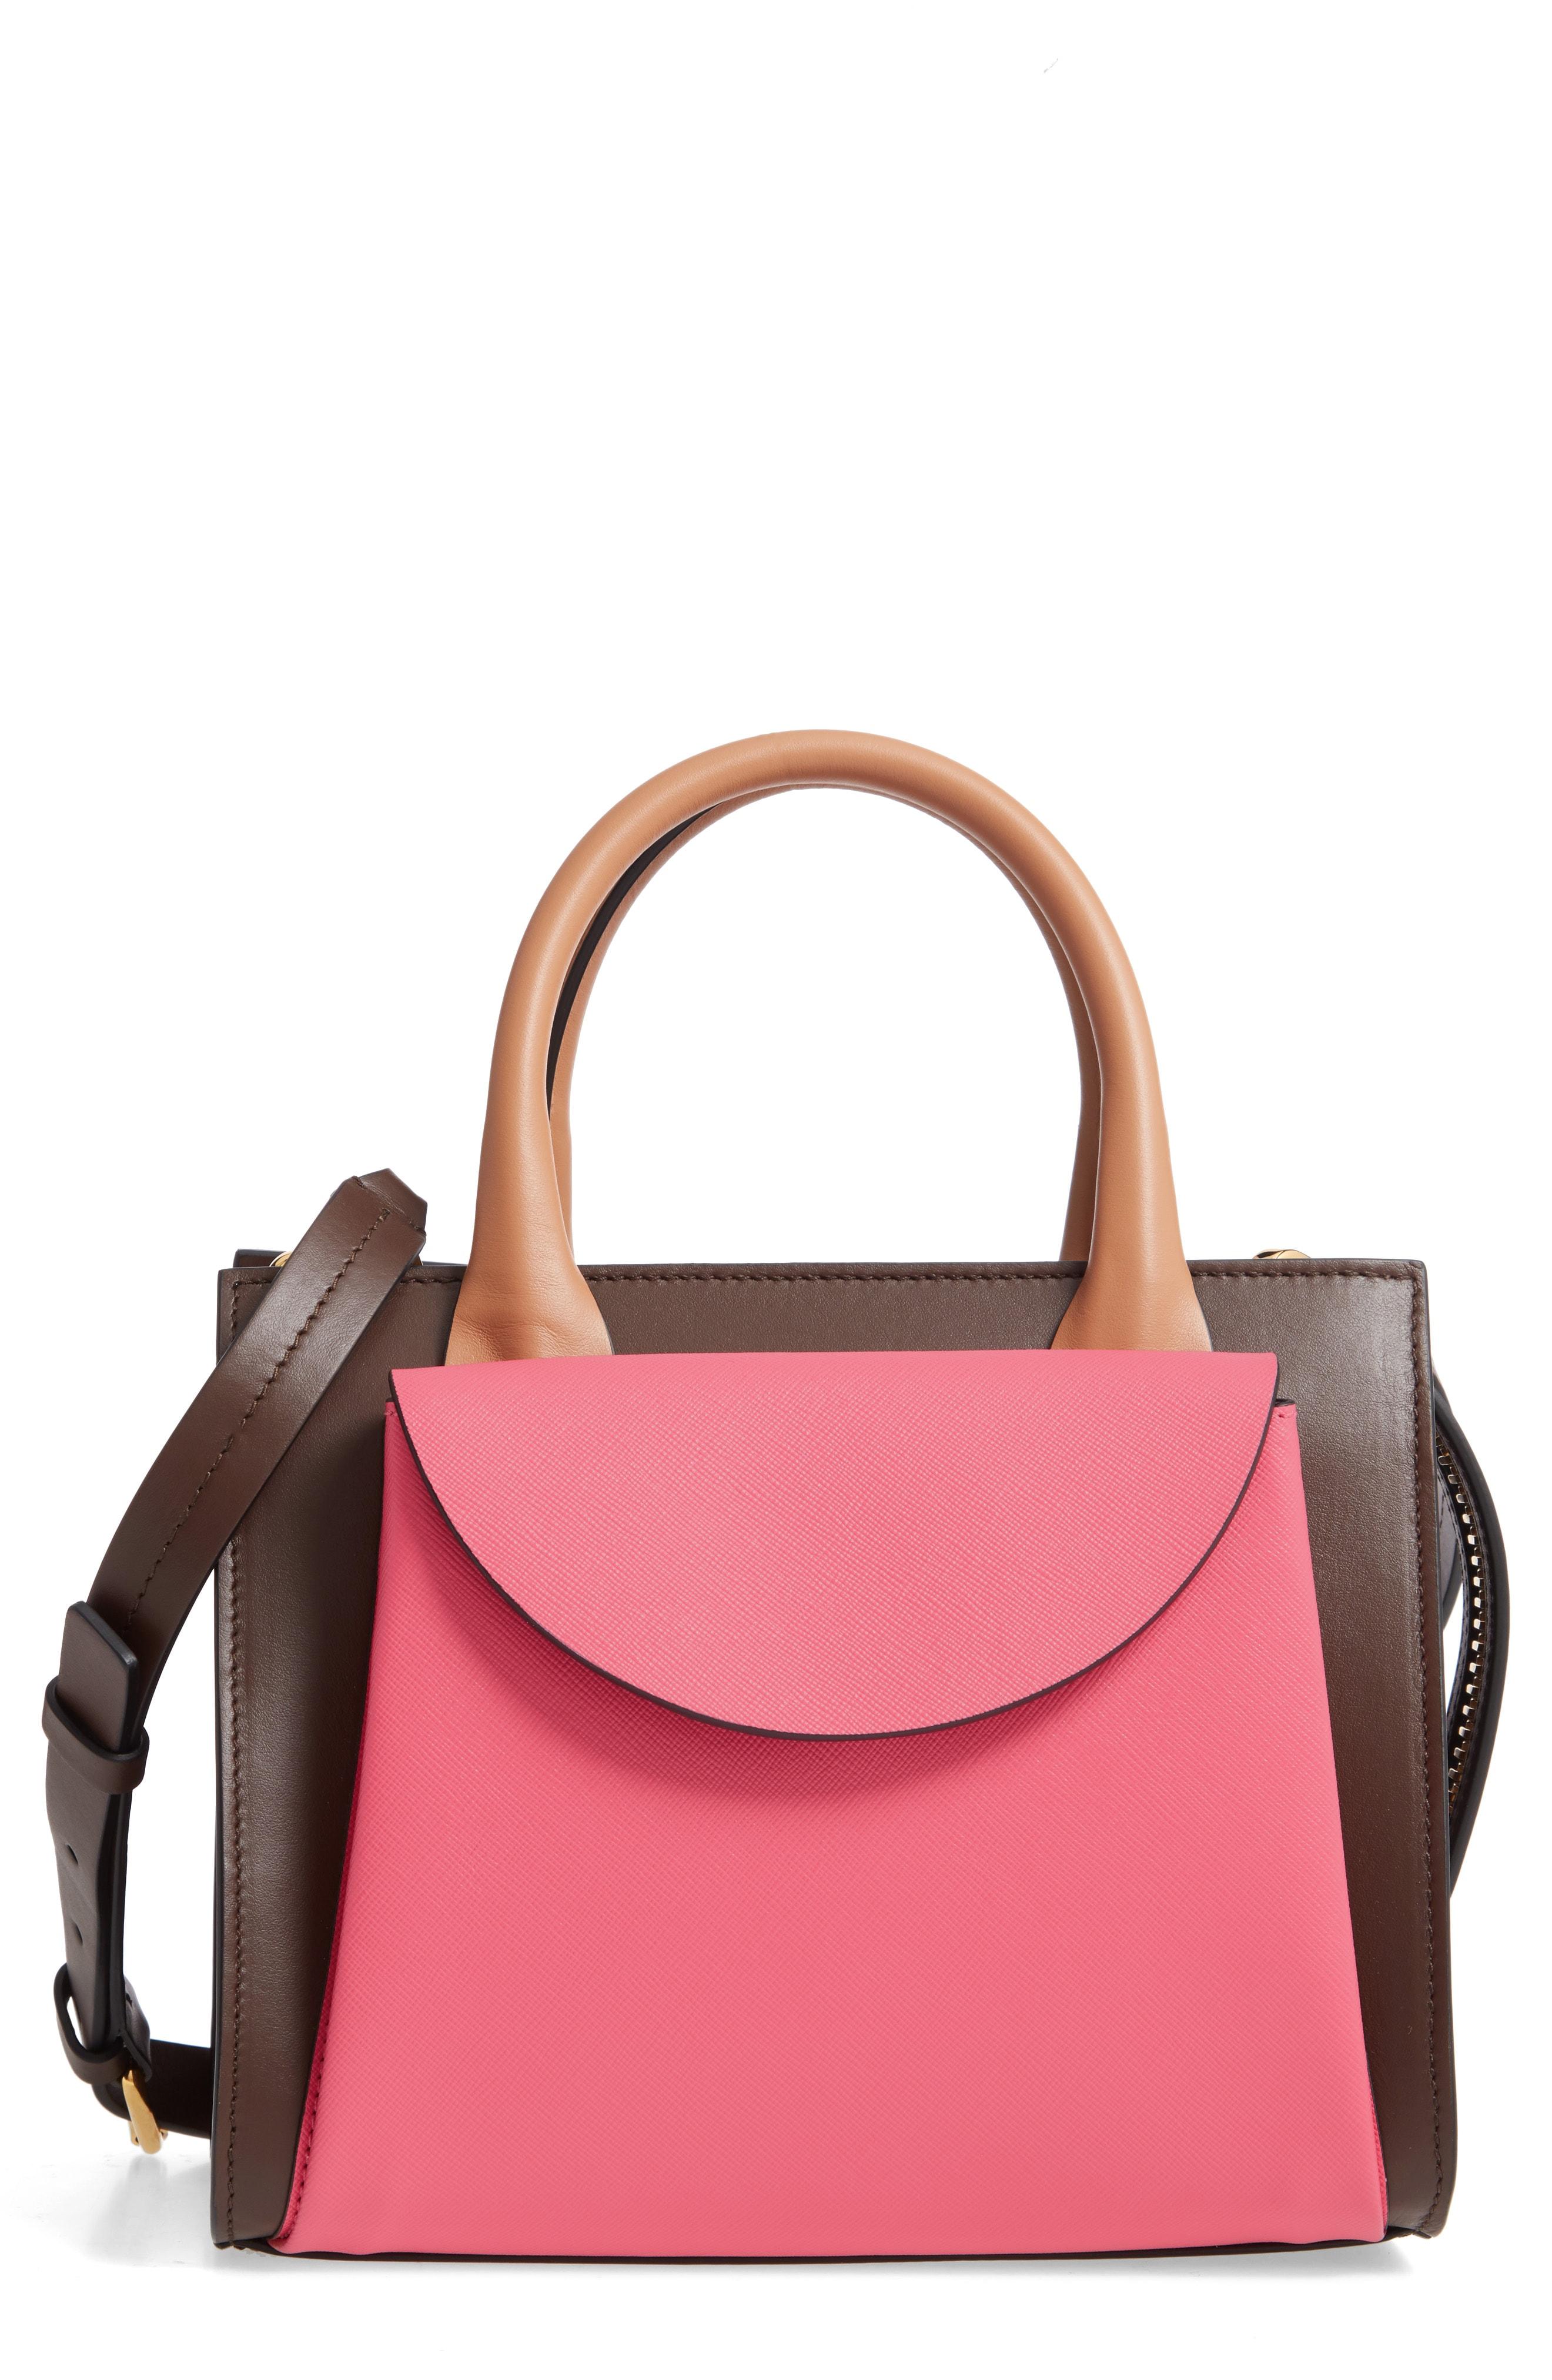 Women's Designer Handbags & Wallets | Nordstrom